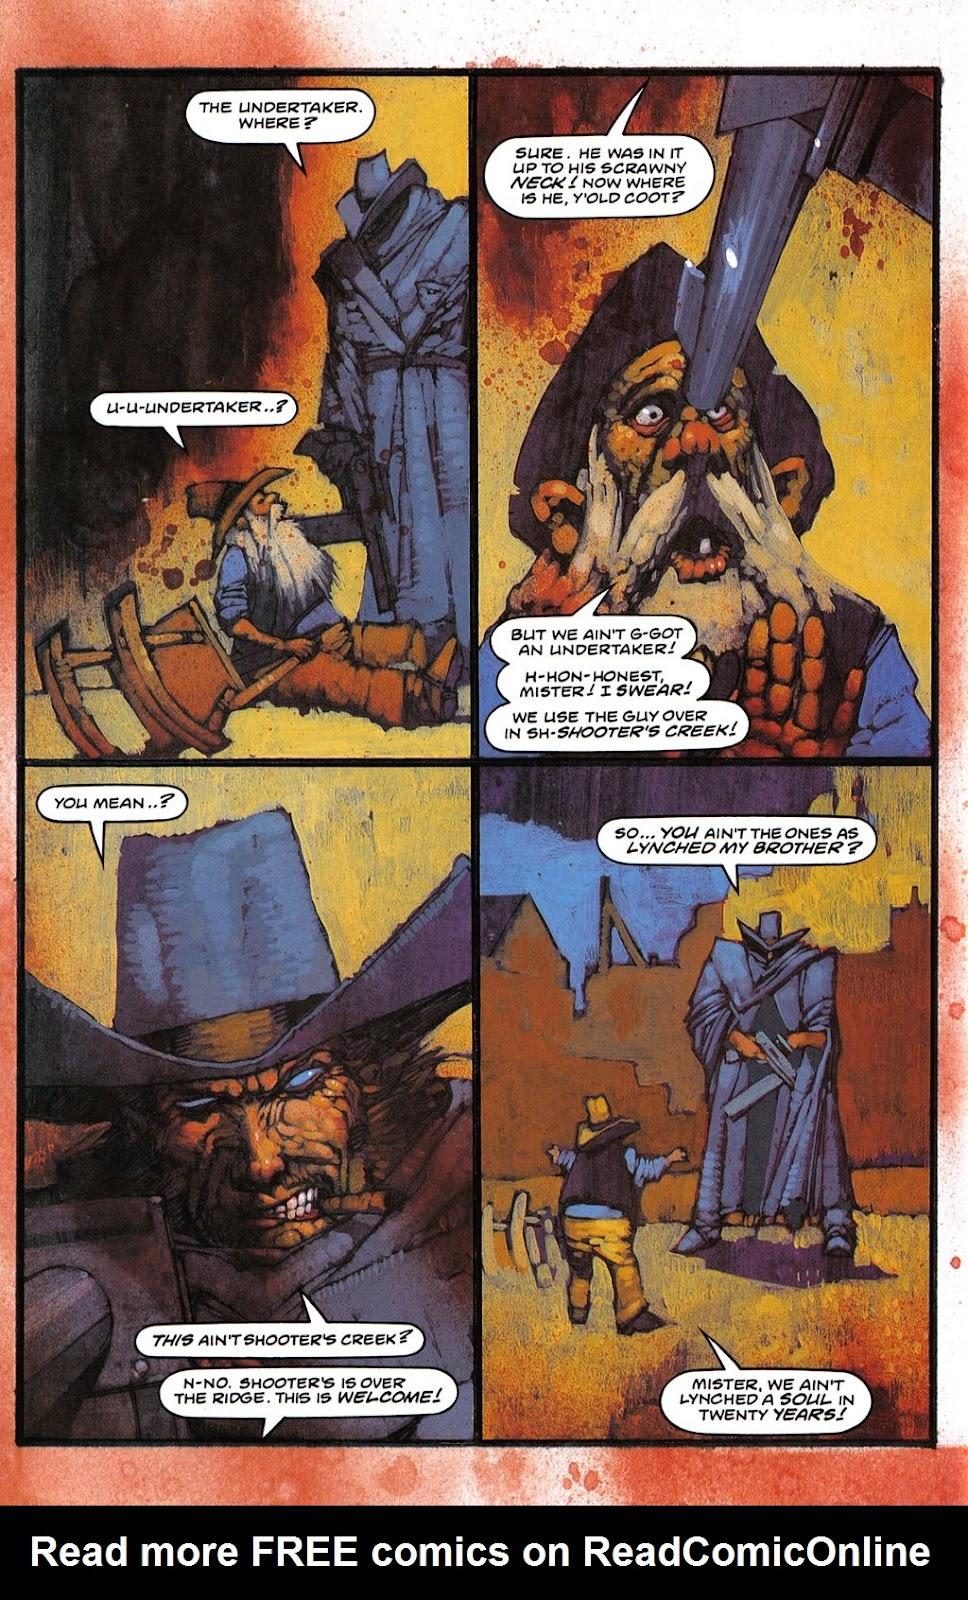 Read online Bisley's Scrapbook comic -  Issue # Full - 32